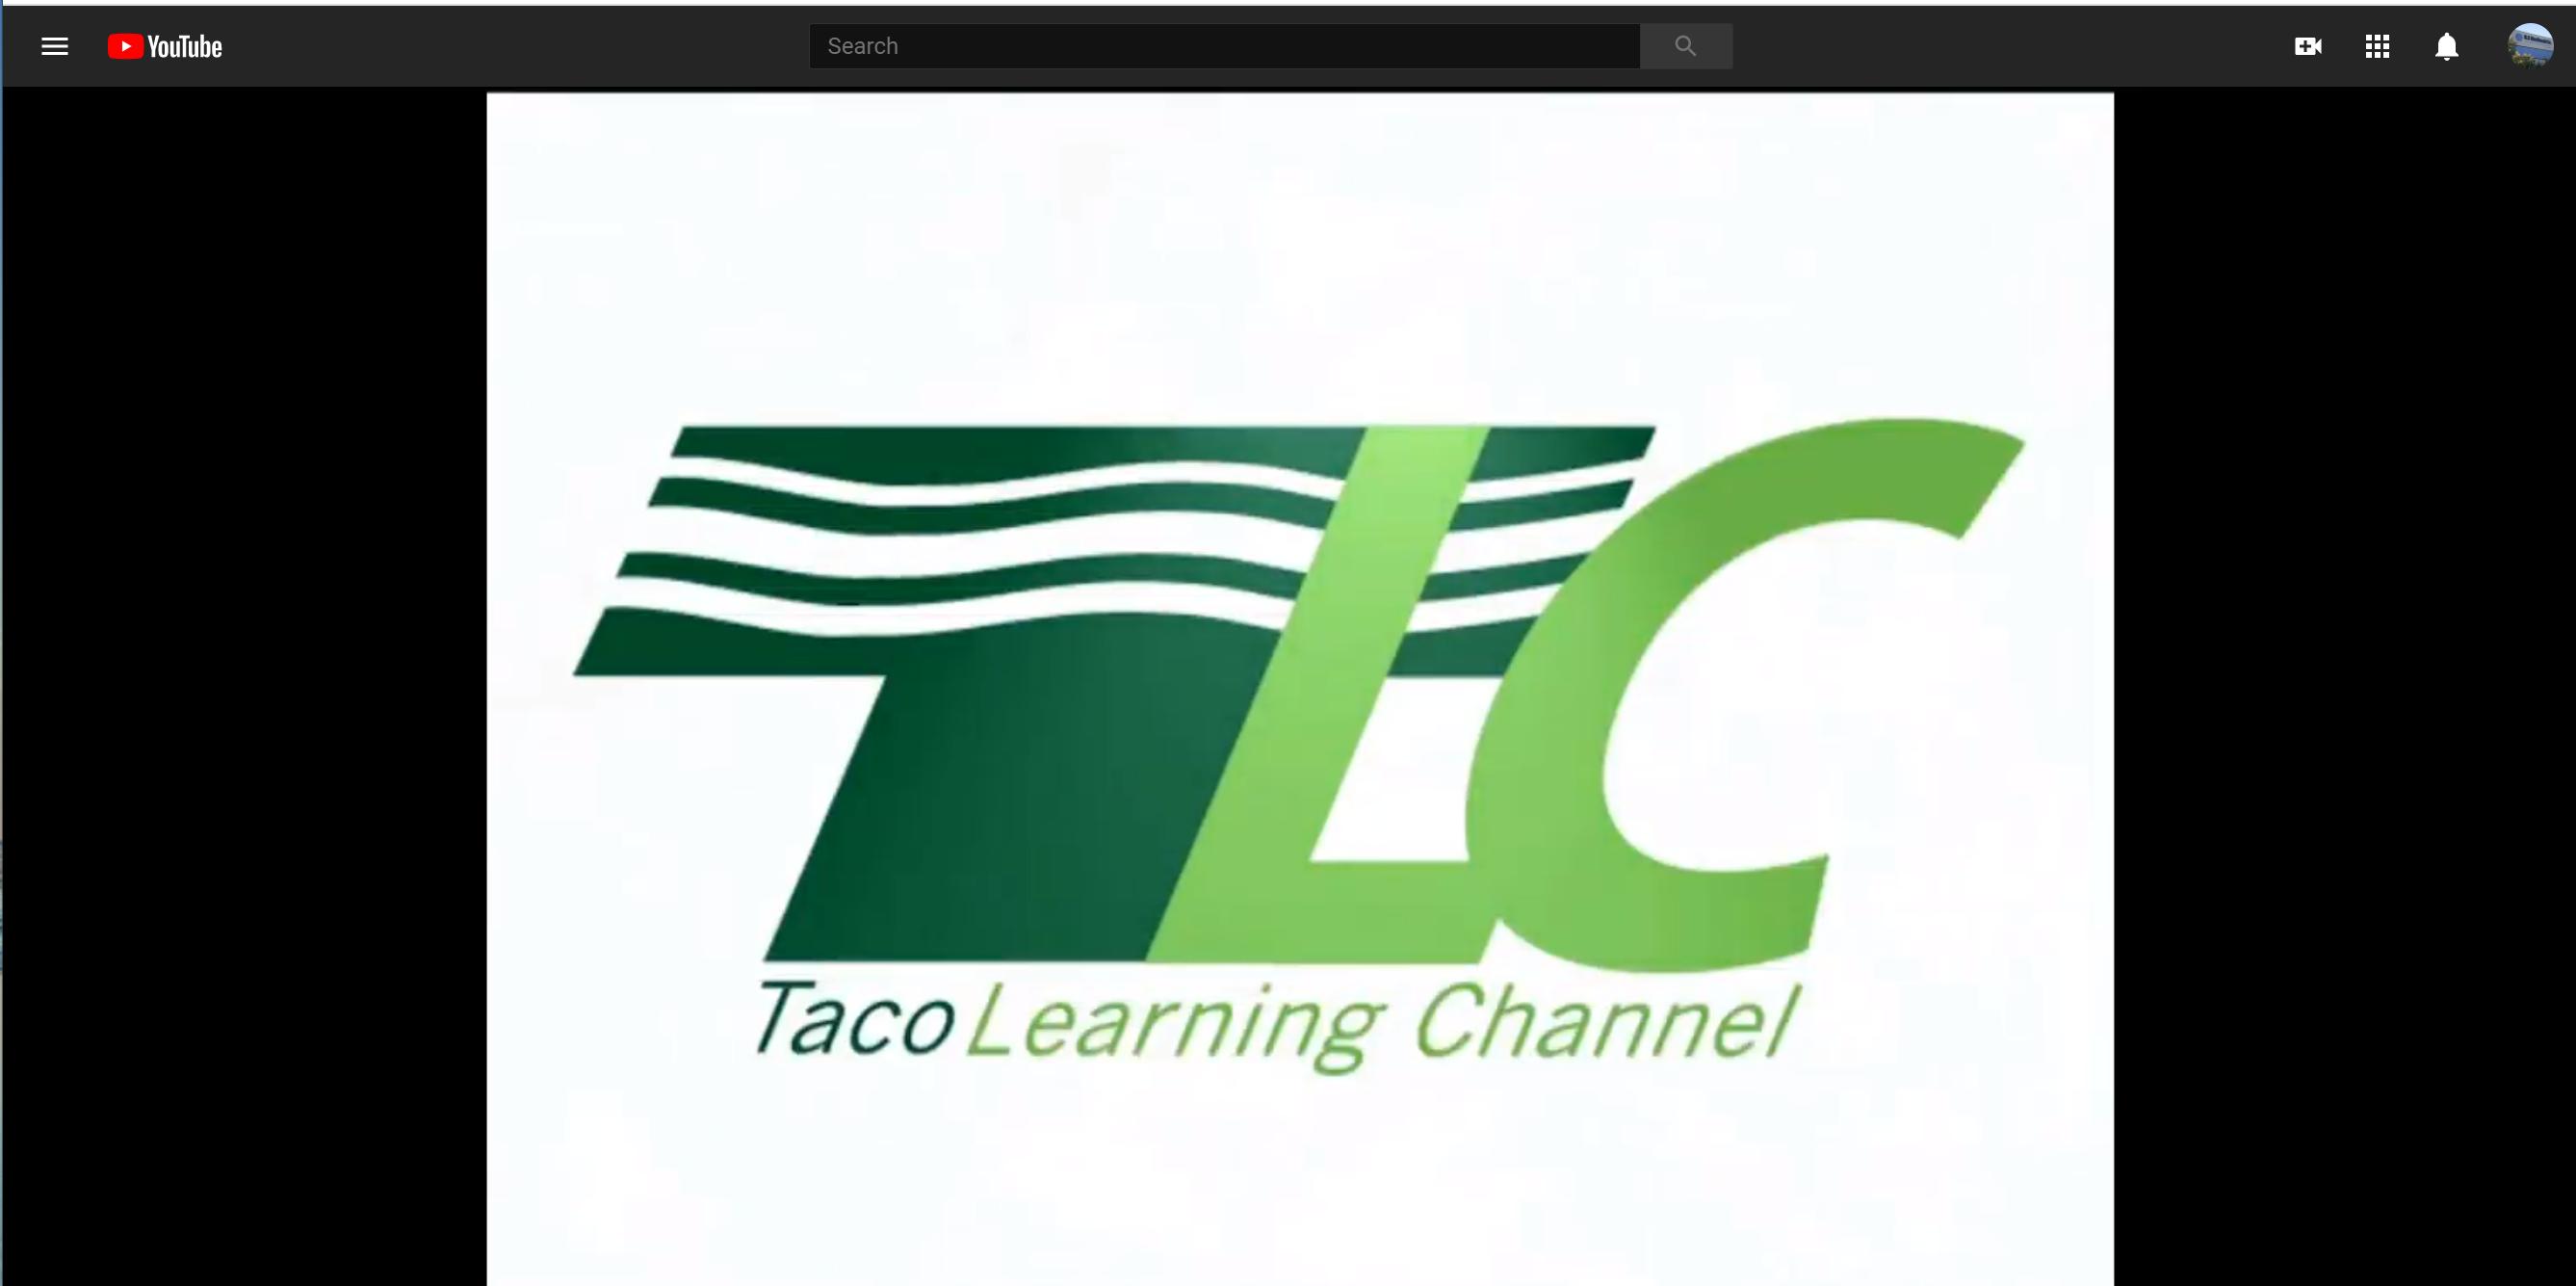 taco-pump-video-tutorial